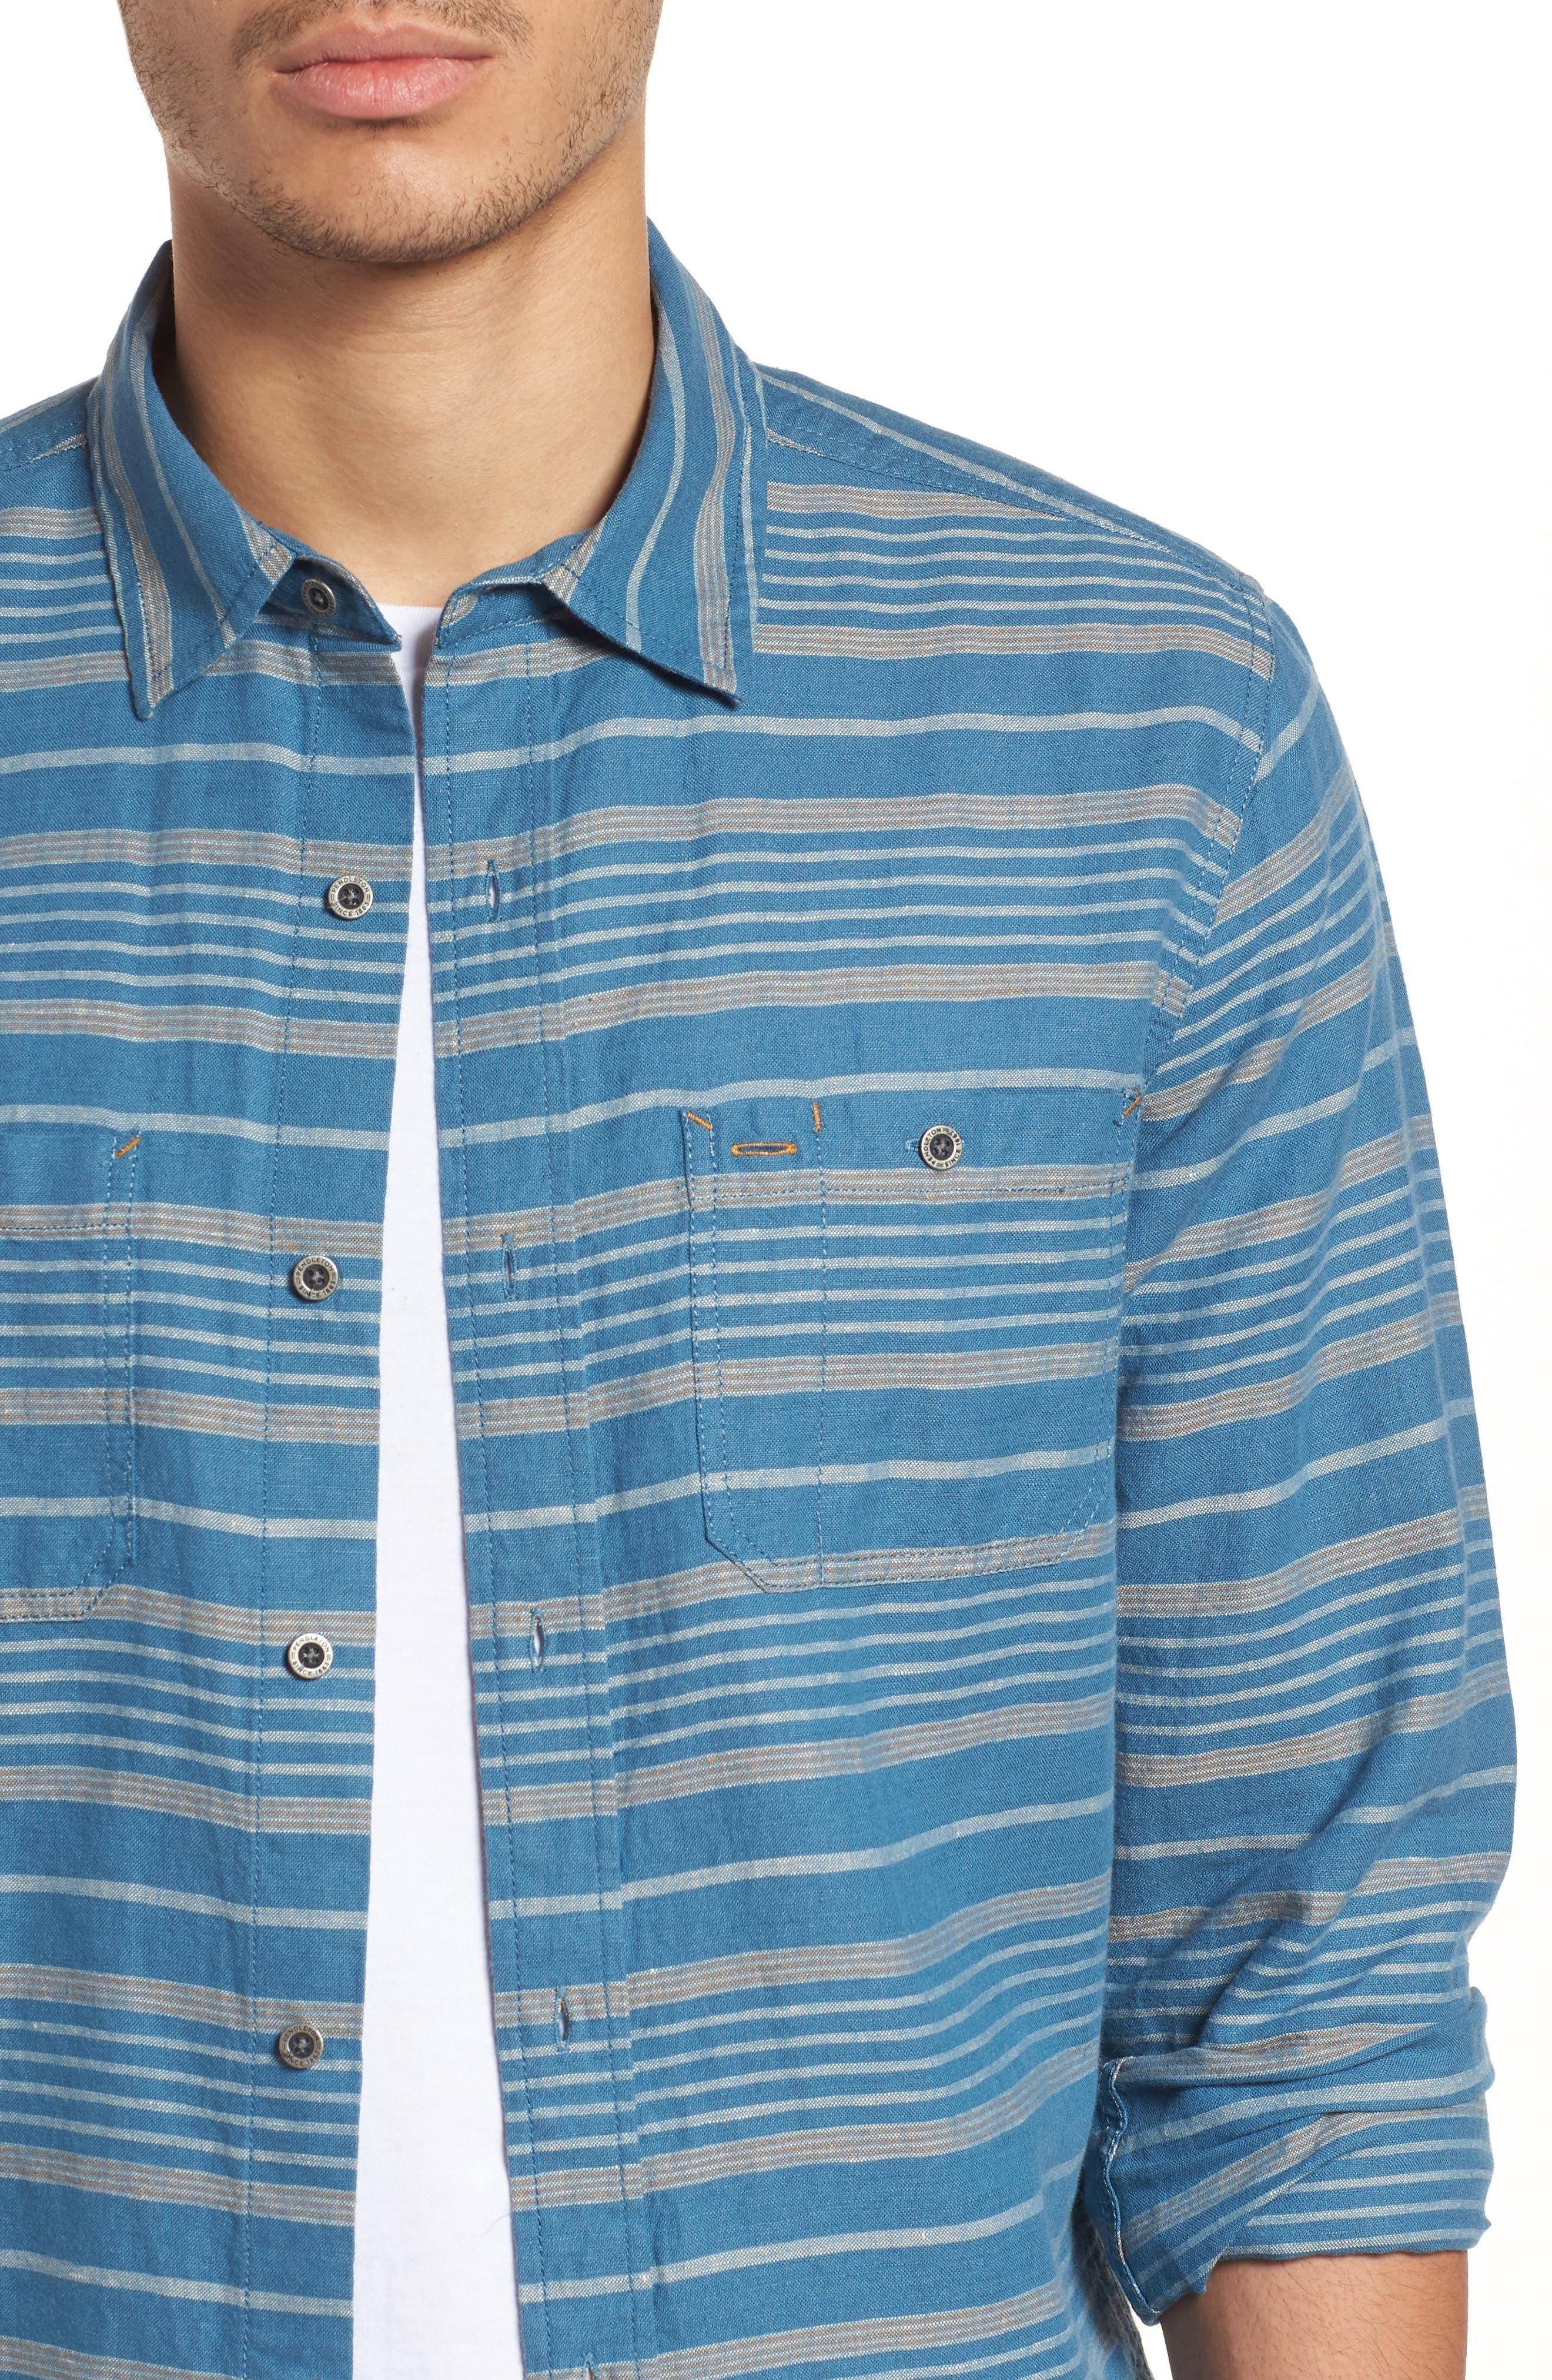 Kay Street Fitted Shirt,                             Alternate thumbnail 4, color,                             Navy/ Cream Stripe